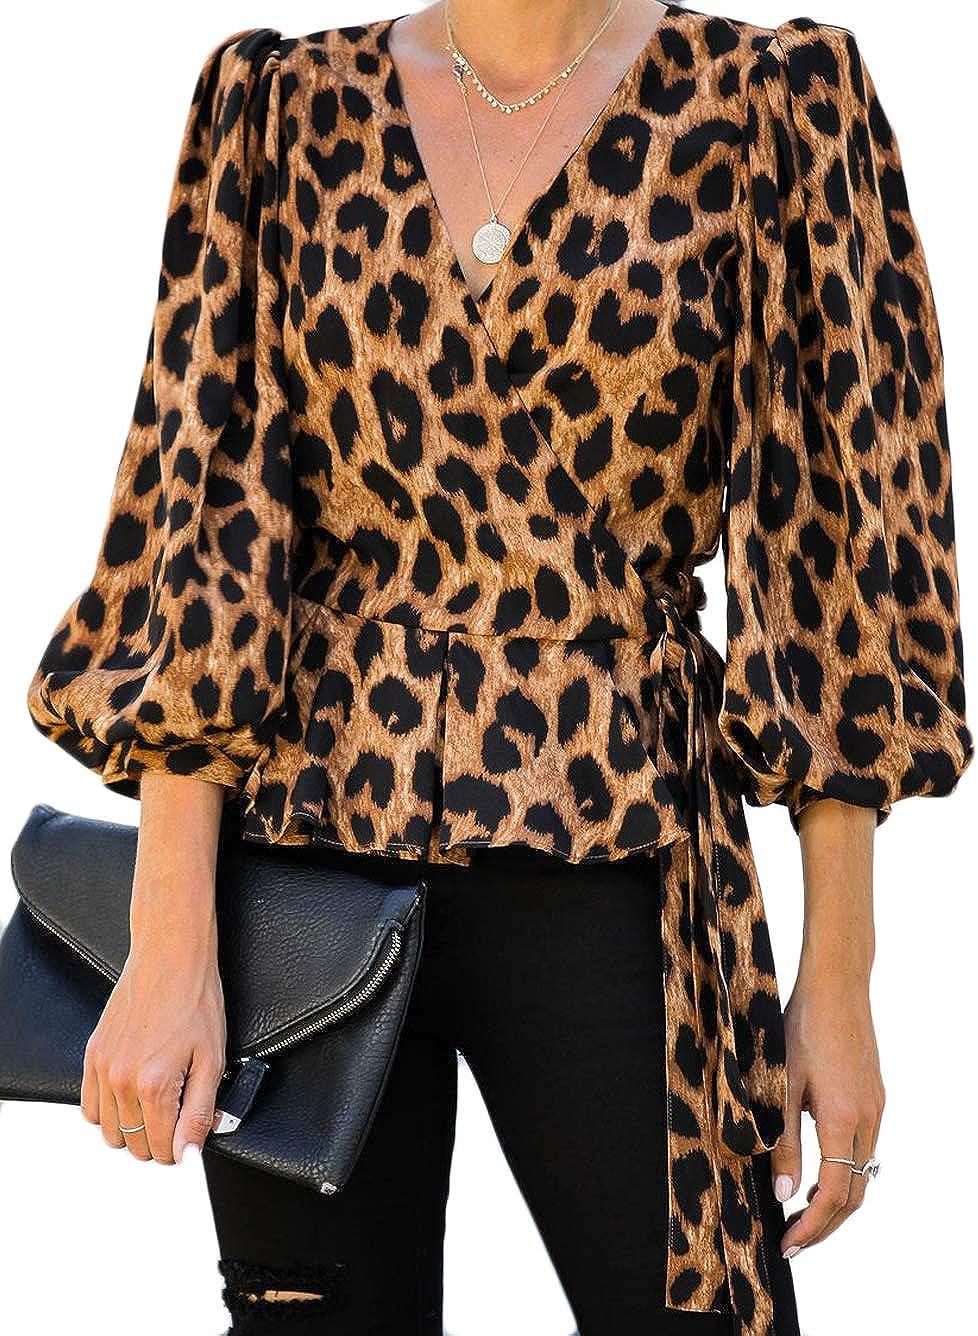 Eff You See Kay Why Oh You Womens Cute Pattern Cat and Fish Print Tops Short Sleeve Cheetah Animal Print Funny Mama Graphic Tees T Shirts Blouses